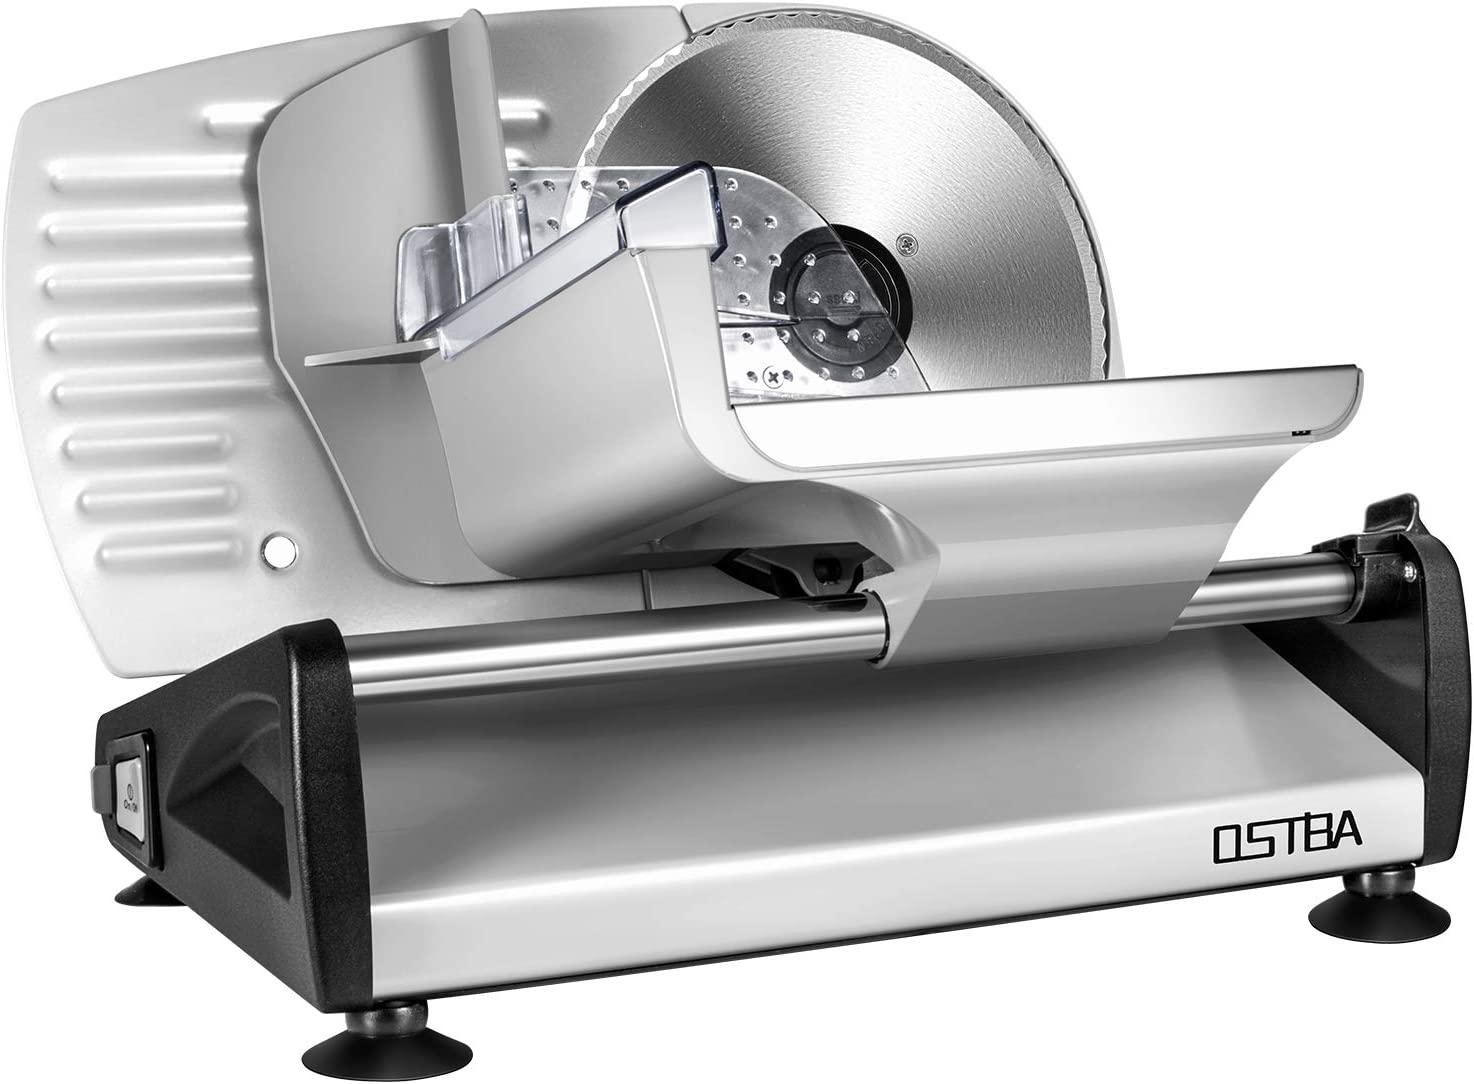 Cortafiambres eléctrico de acero inoxidable, cortador de salchichas con grosor de corte ajustable (0 – 15 mm), máquina de cortar queso, máquina de cortar pan, 150 W, plata, ostba